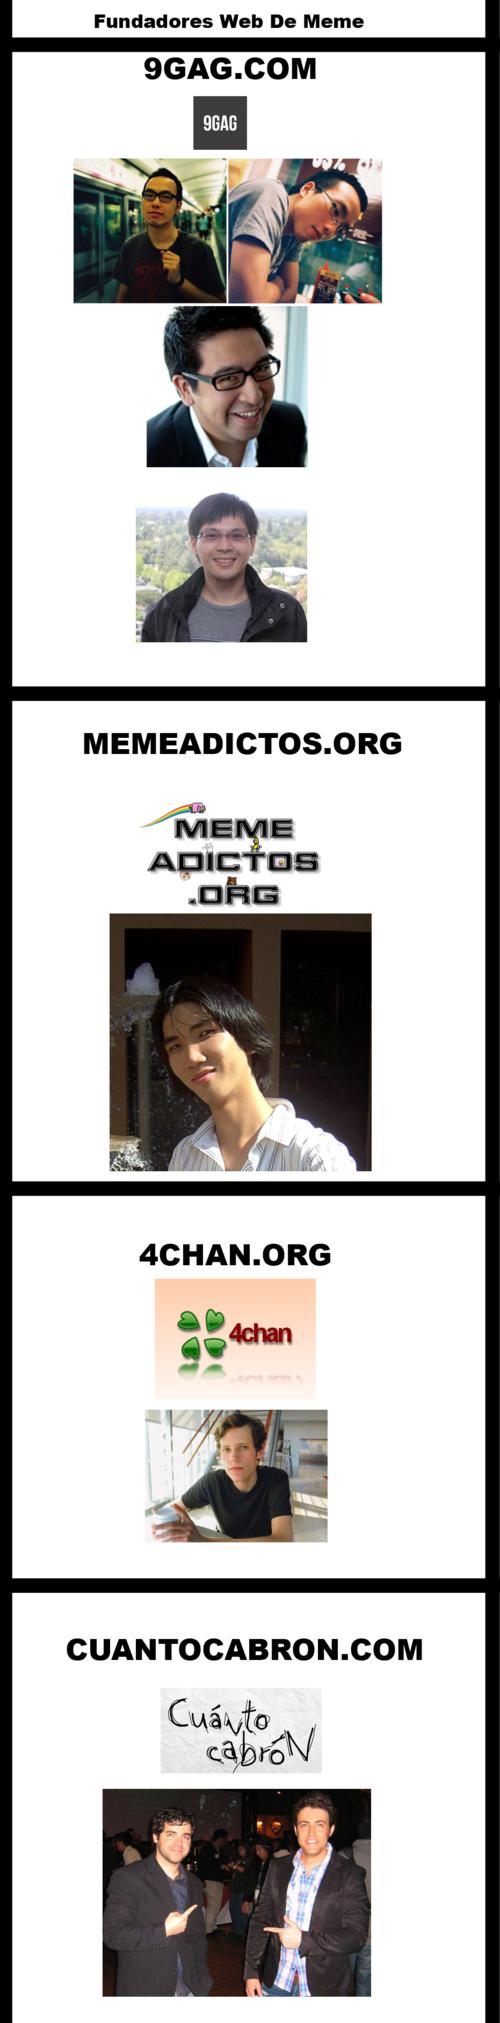 Fundadores_web_de_memes